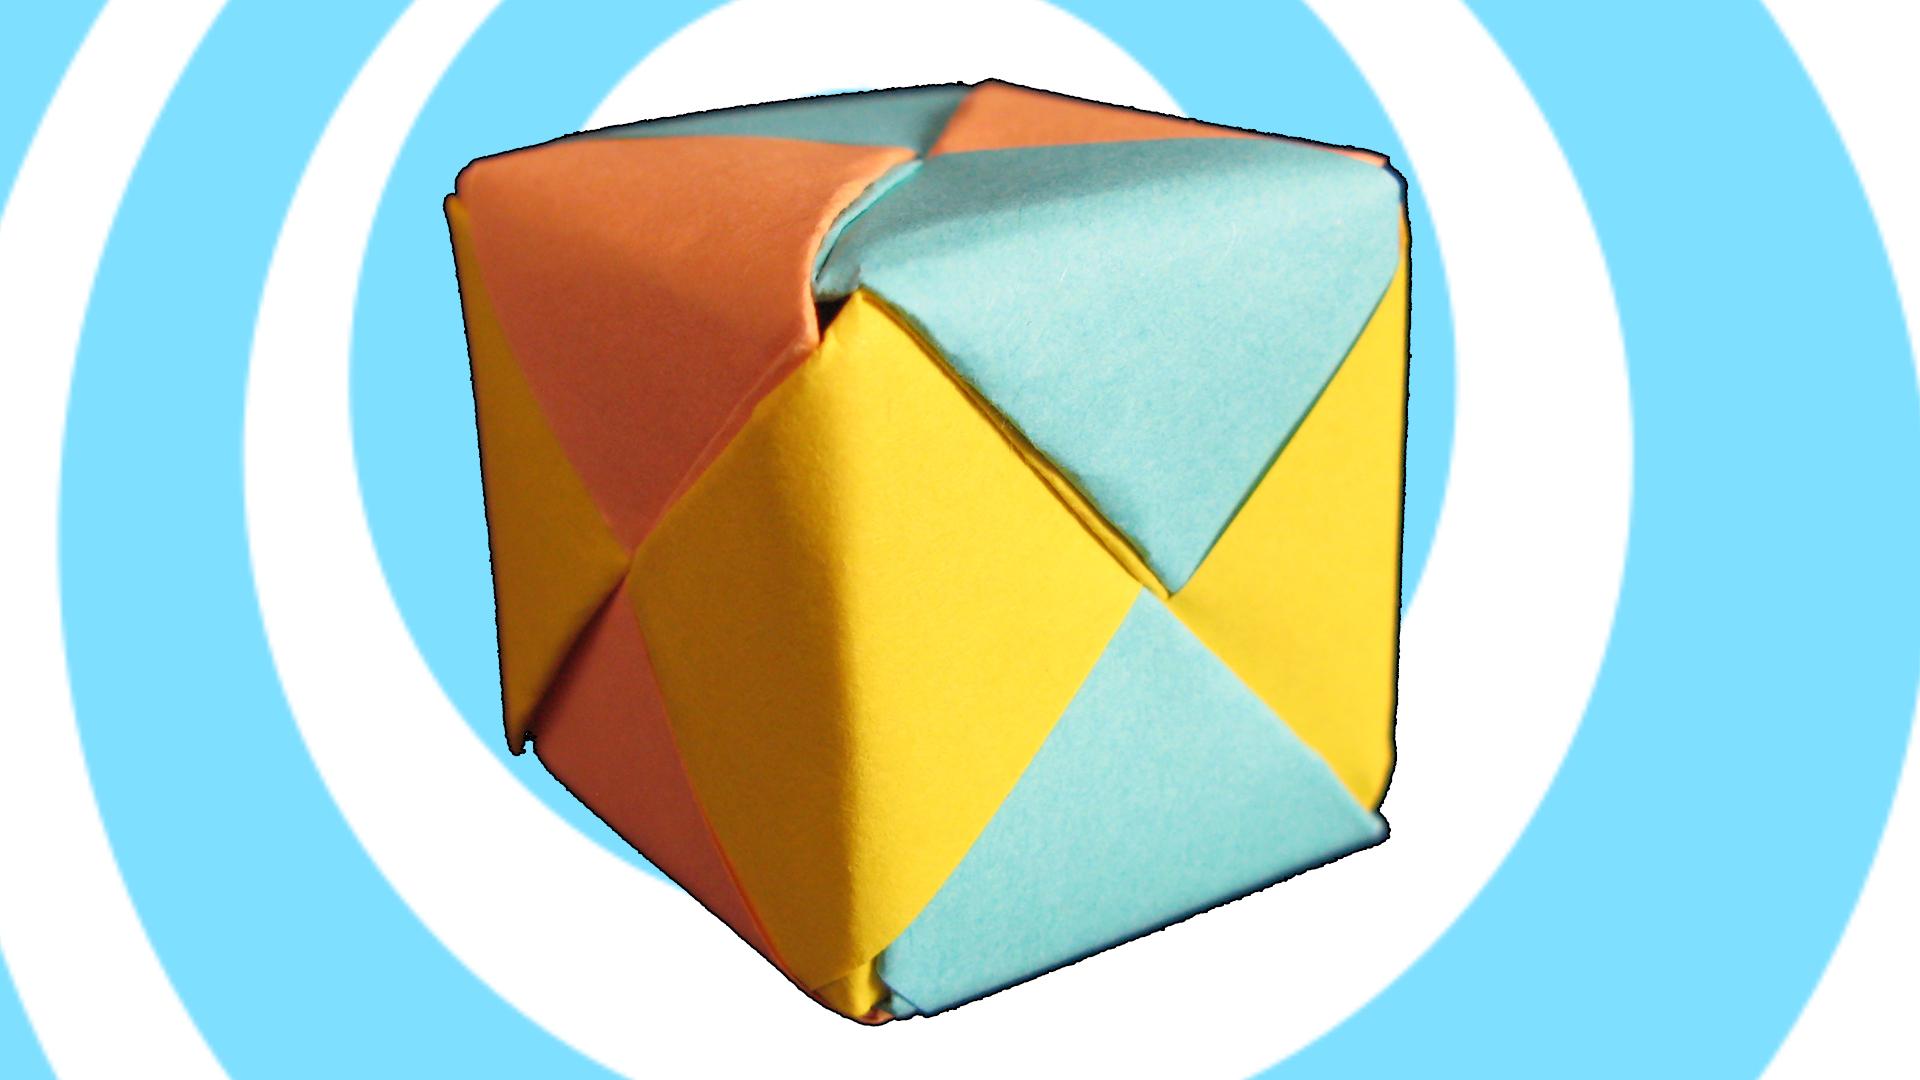 Modular Origami Sonobe Cube  - 6 units